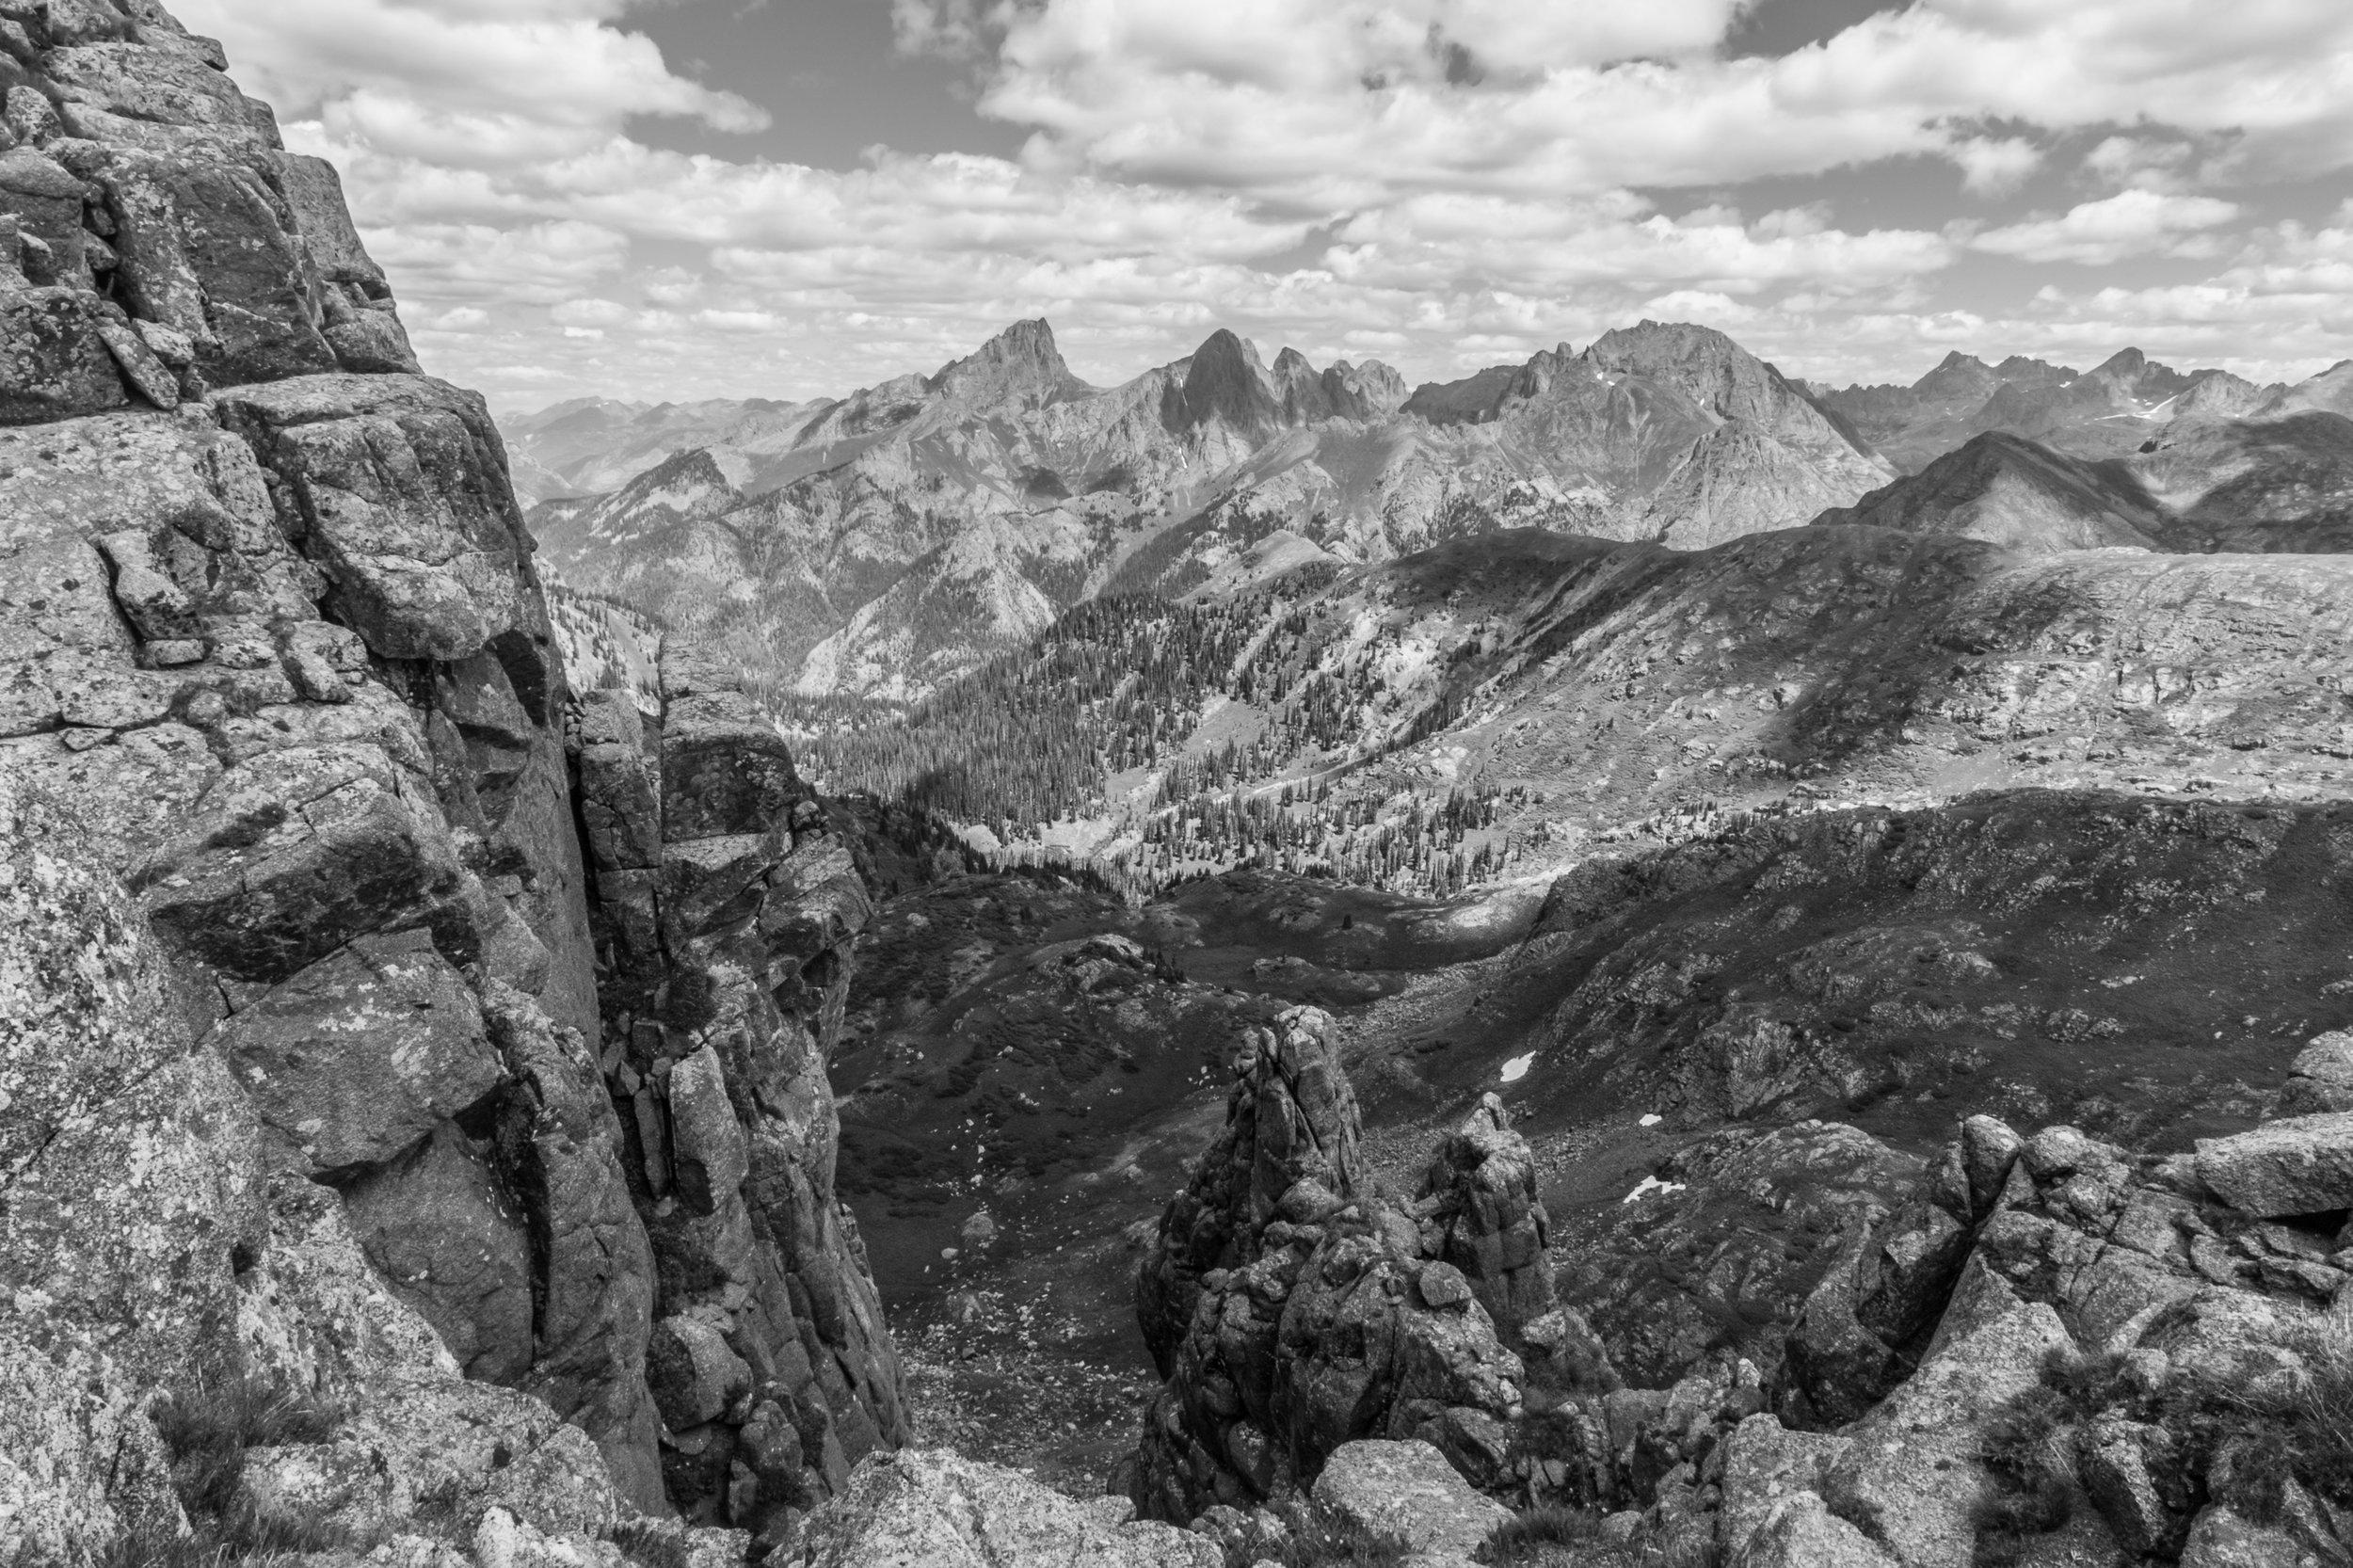 Pidgeon and Turret Peaks in Black & White